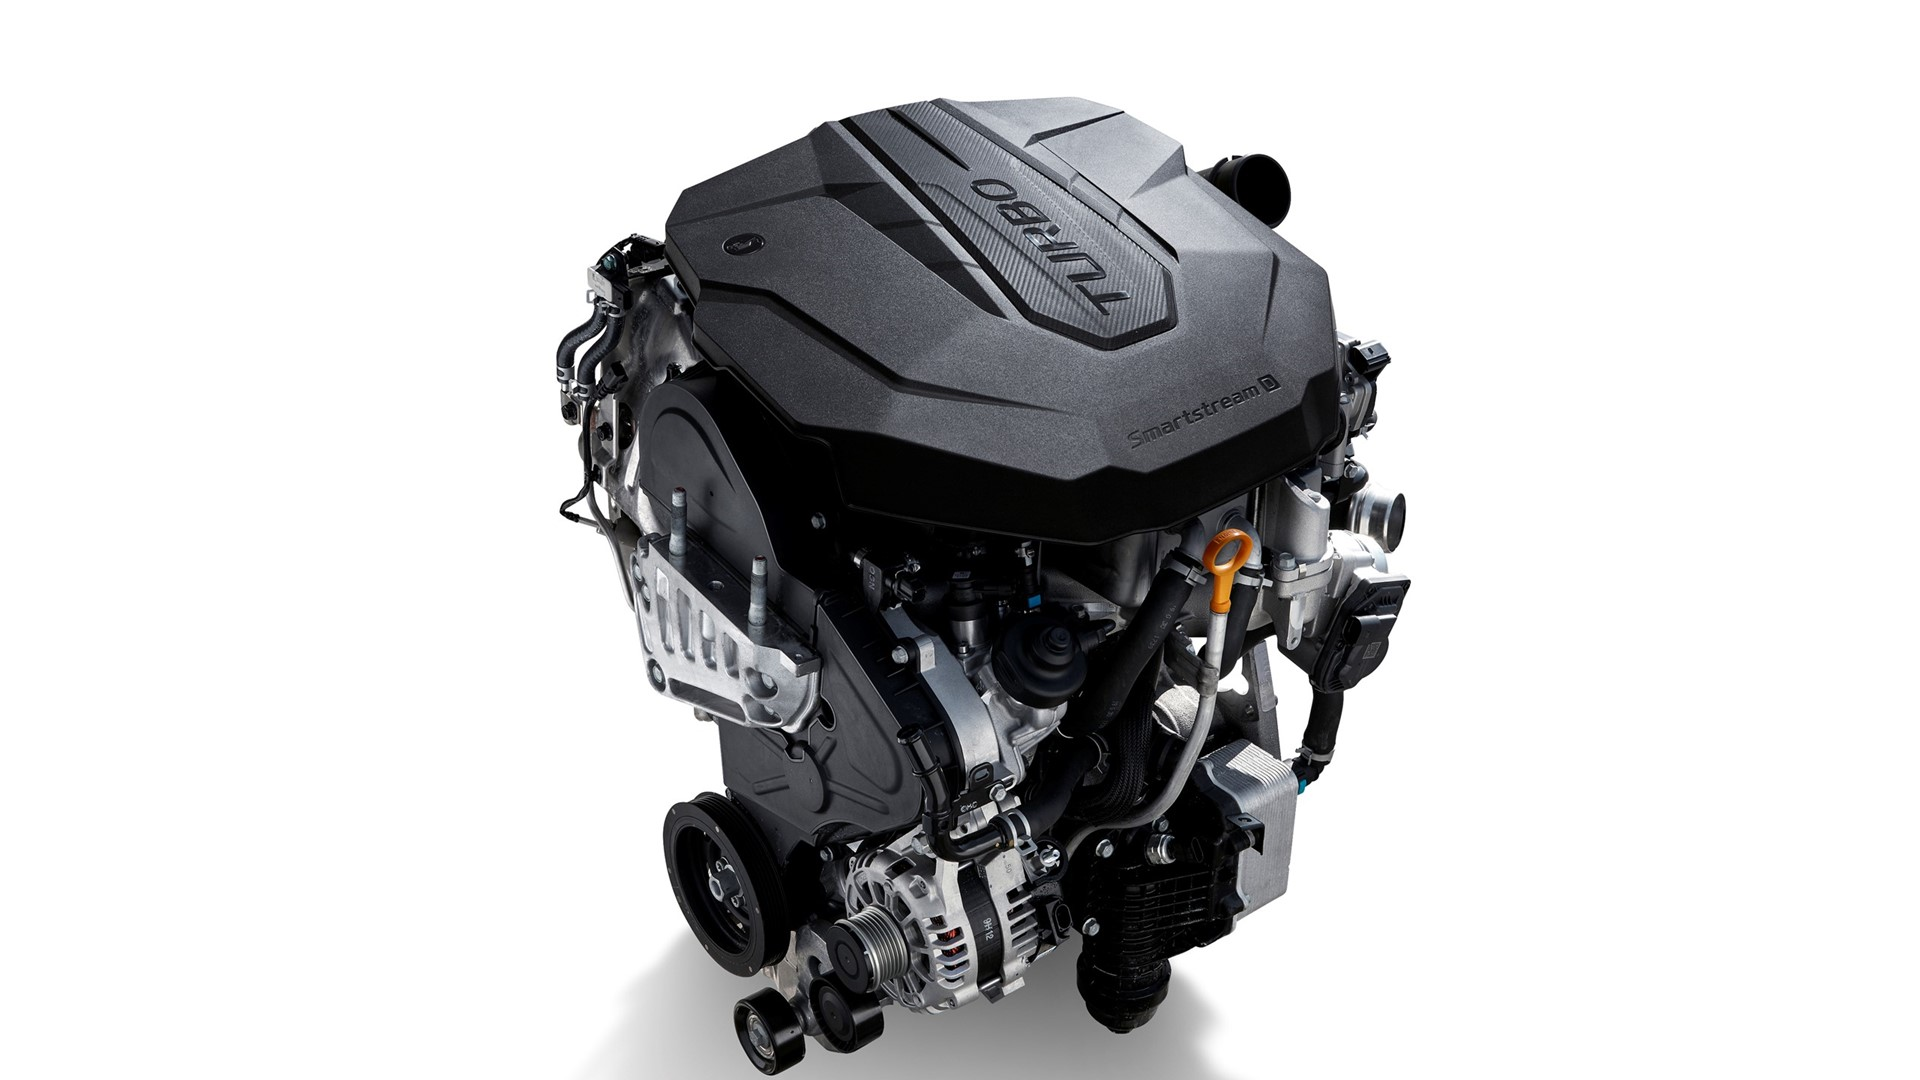 Kia announces new platform and powertrain details for next-generation Sorento - Image 2